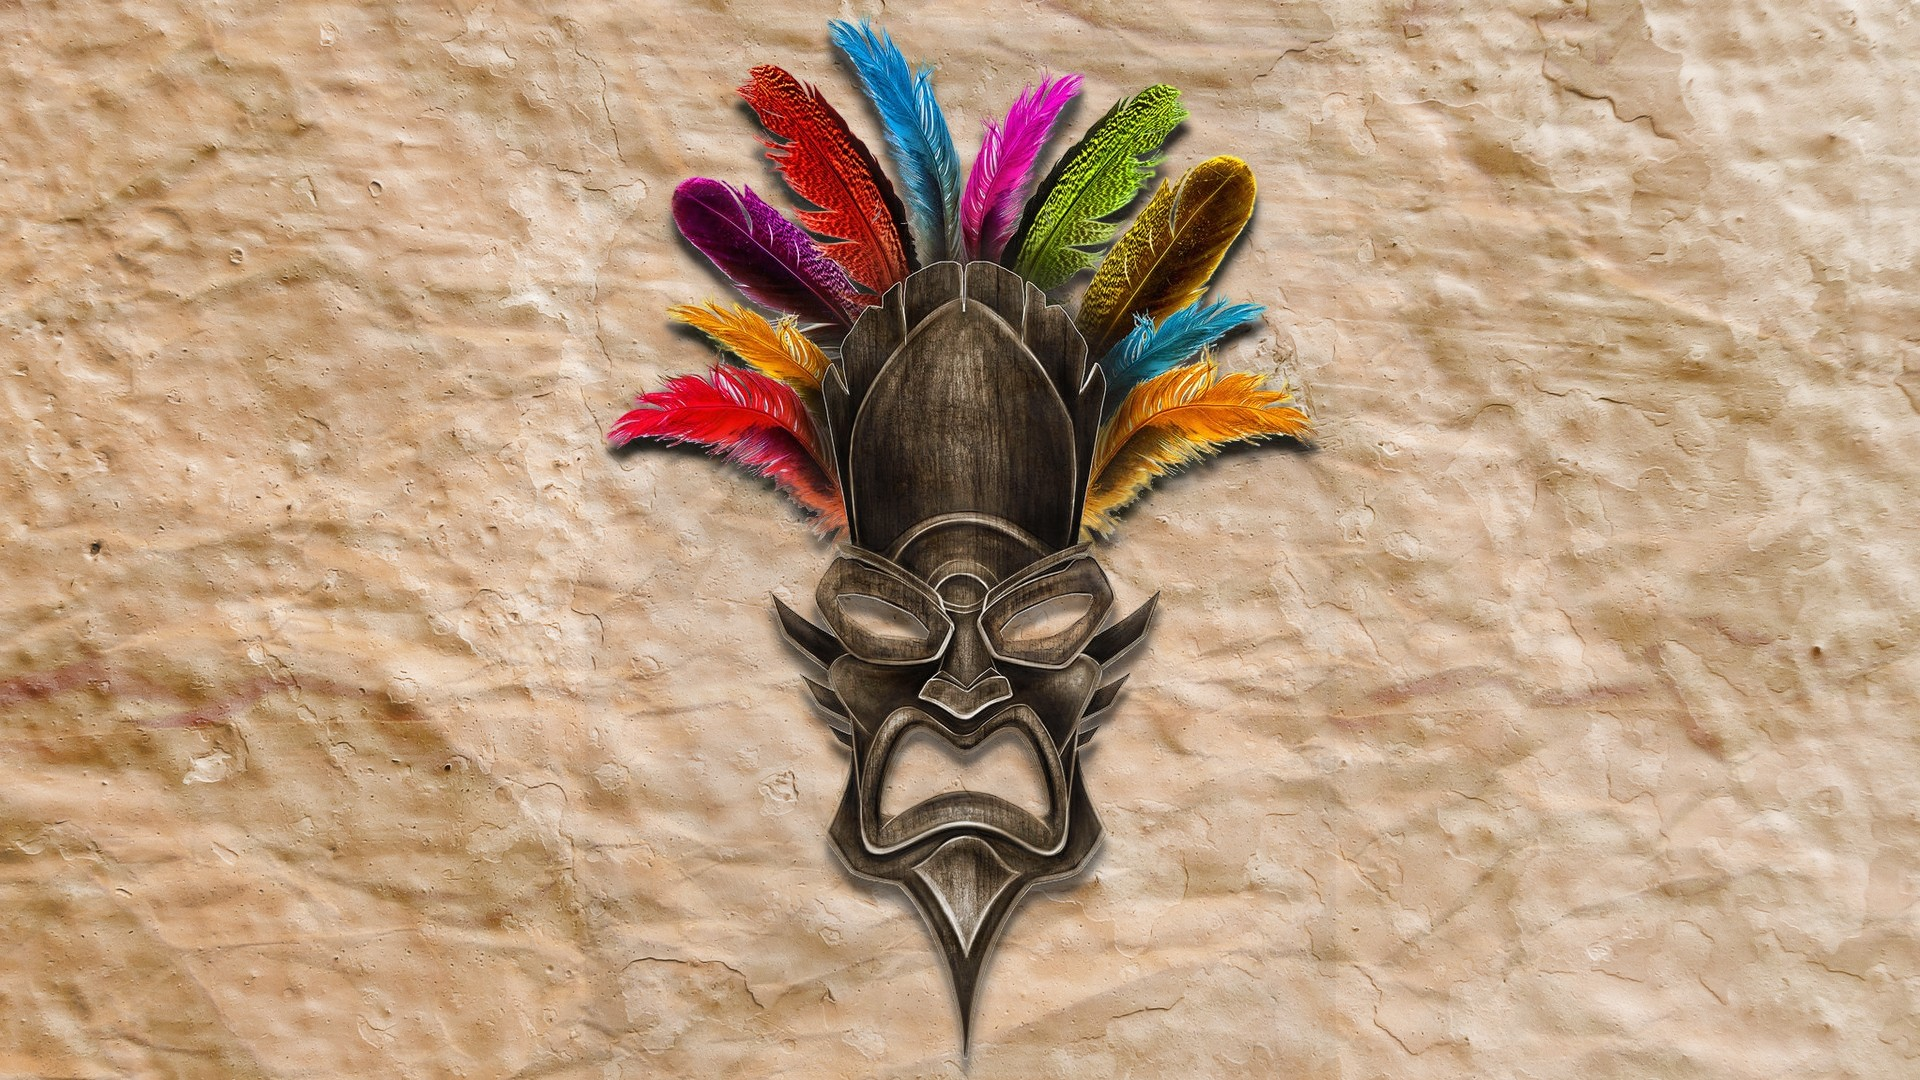 Digital Art Feathers Animals Horns wallpaper Gallery 1920x1080